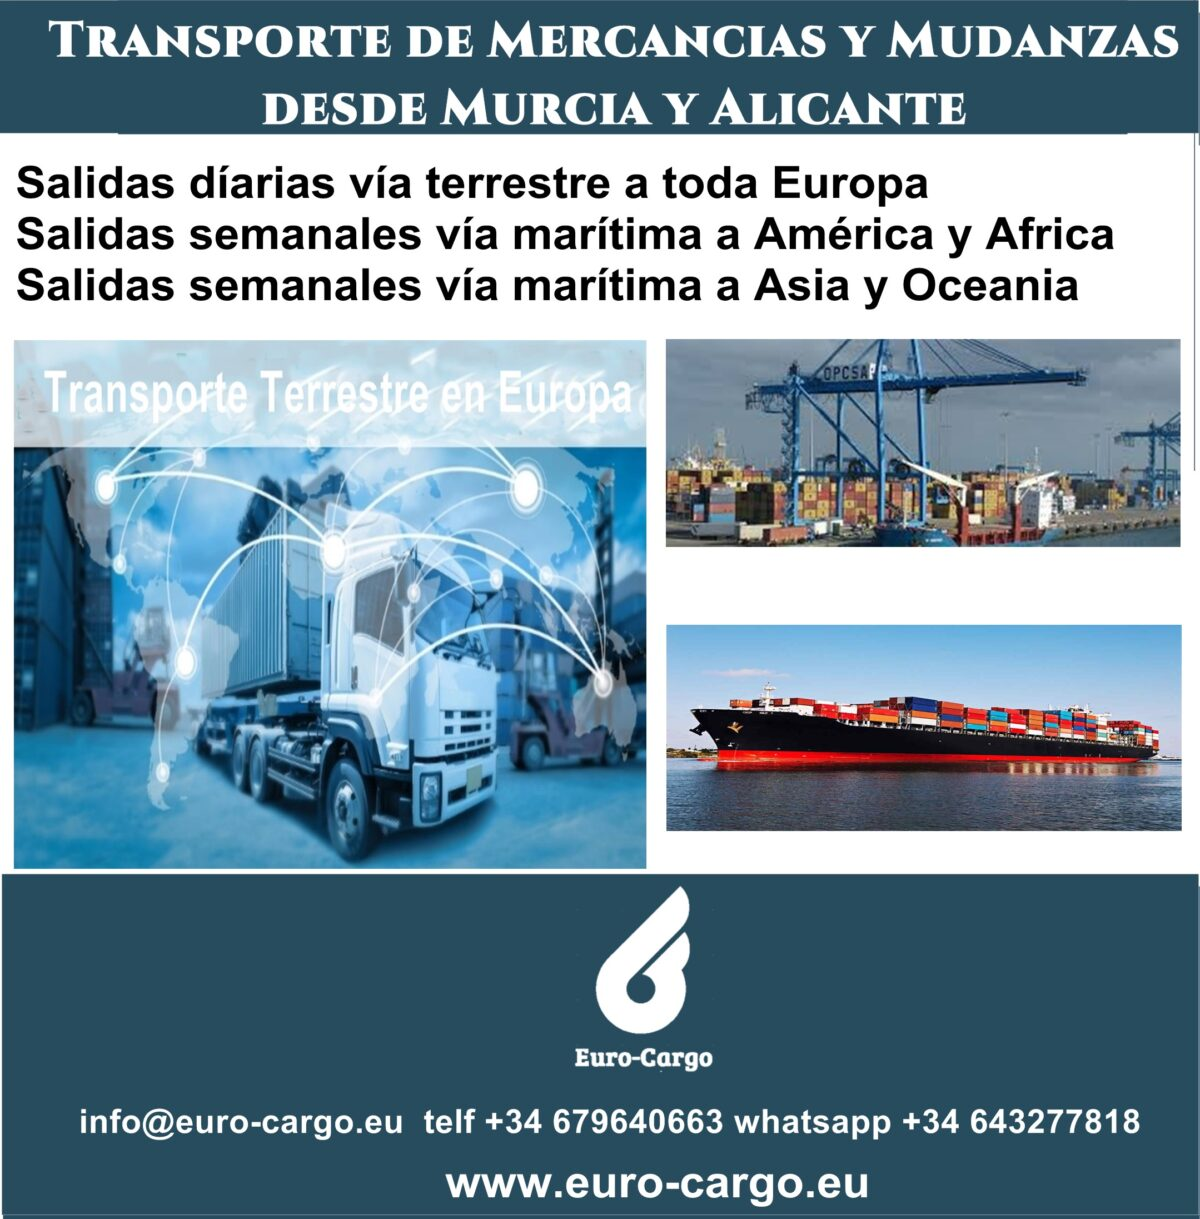 Transporte-desde-Murcia-1200x1219.jpg